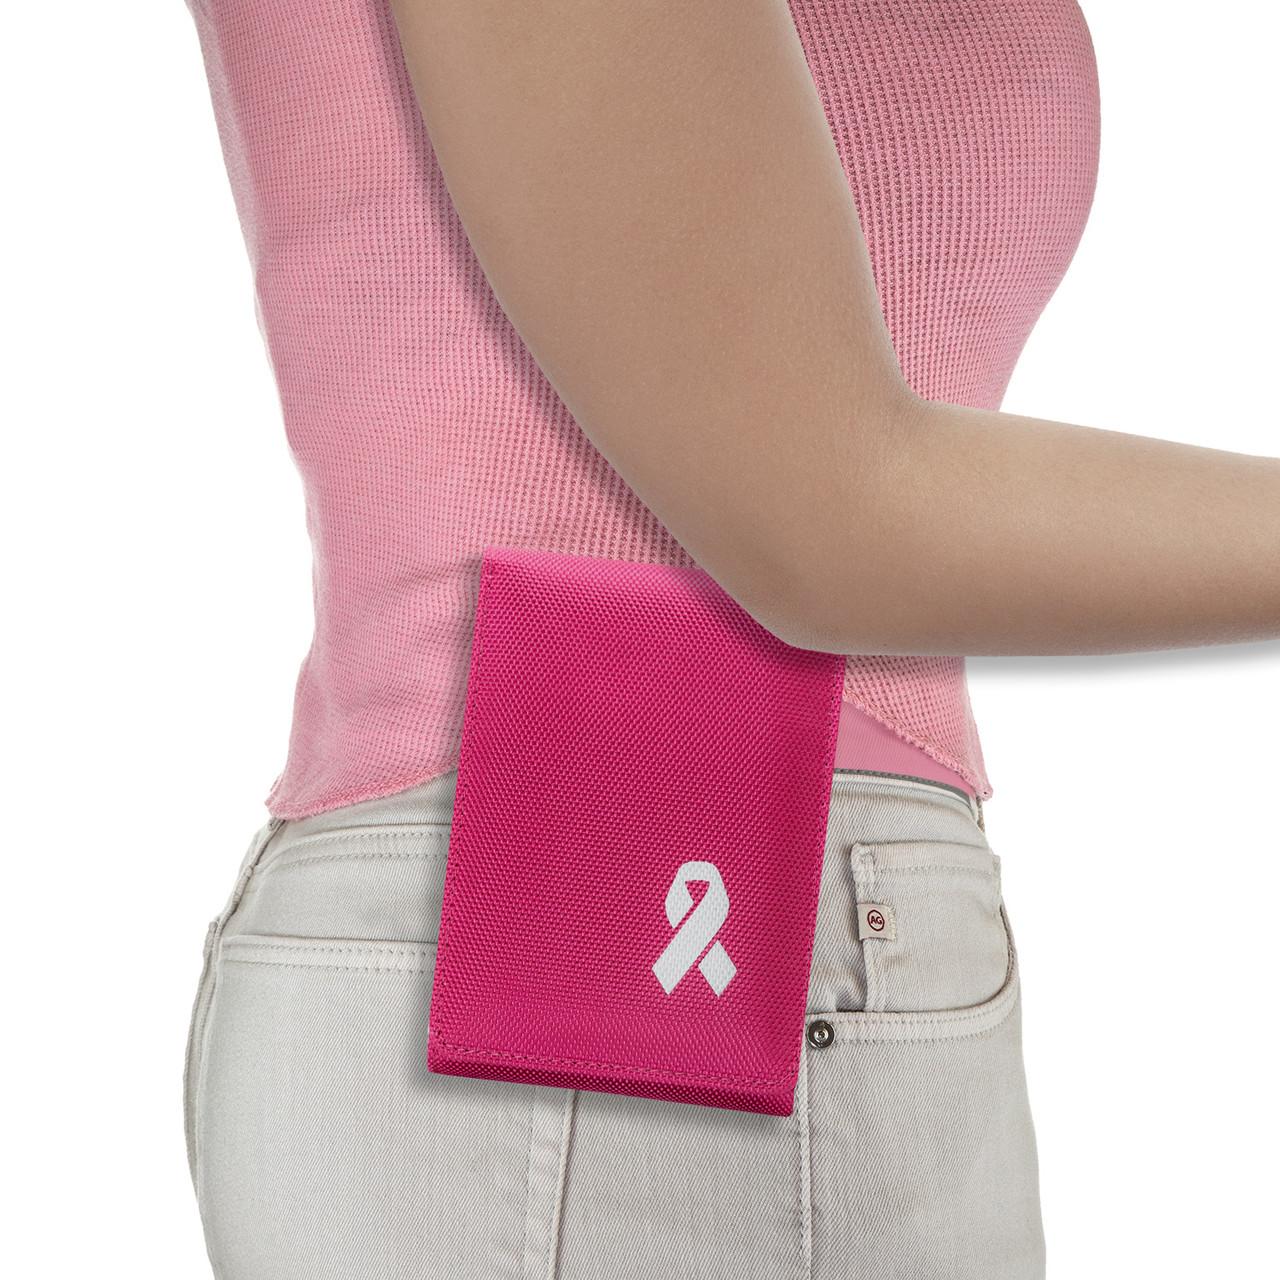 Sig P365 XL Pink Covert Series Holster